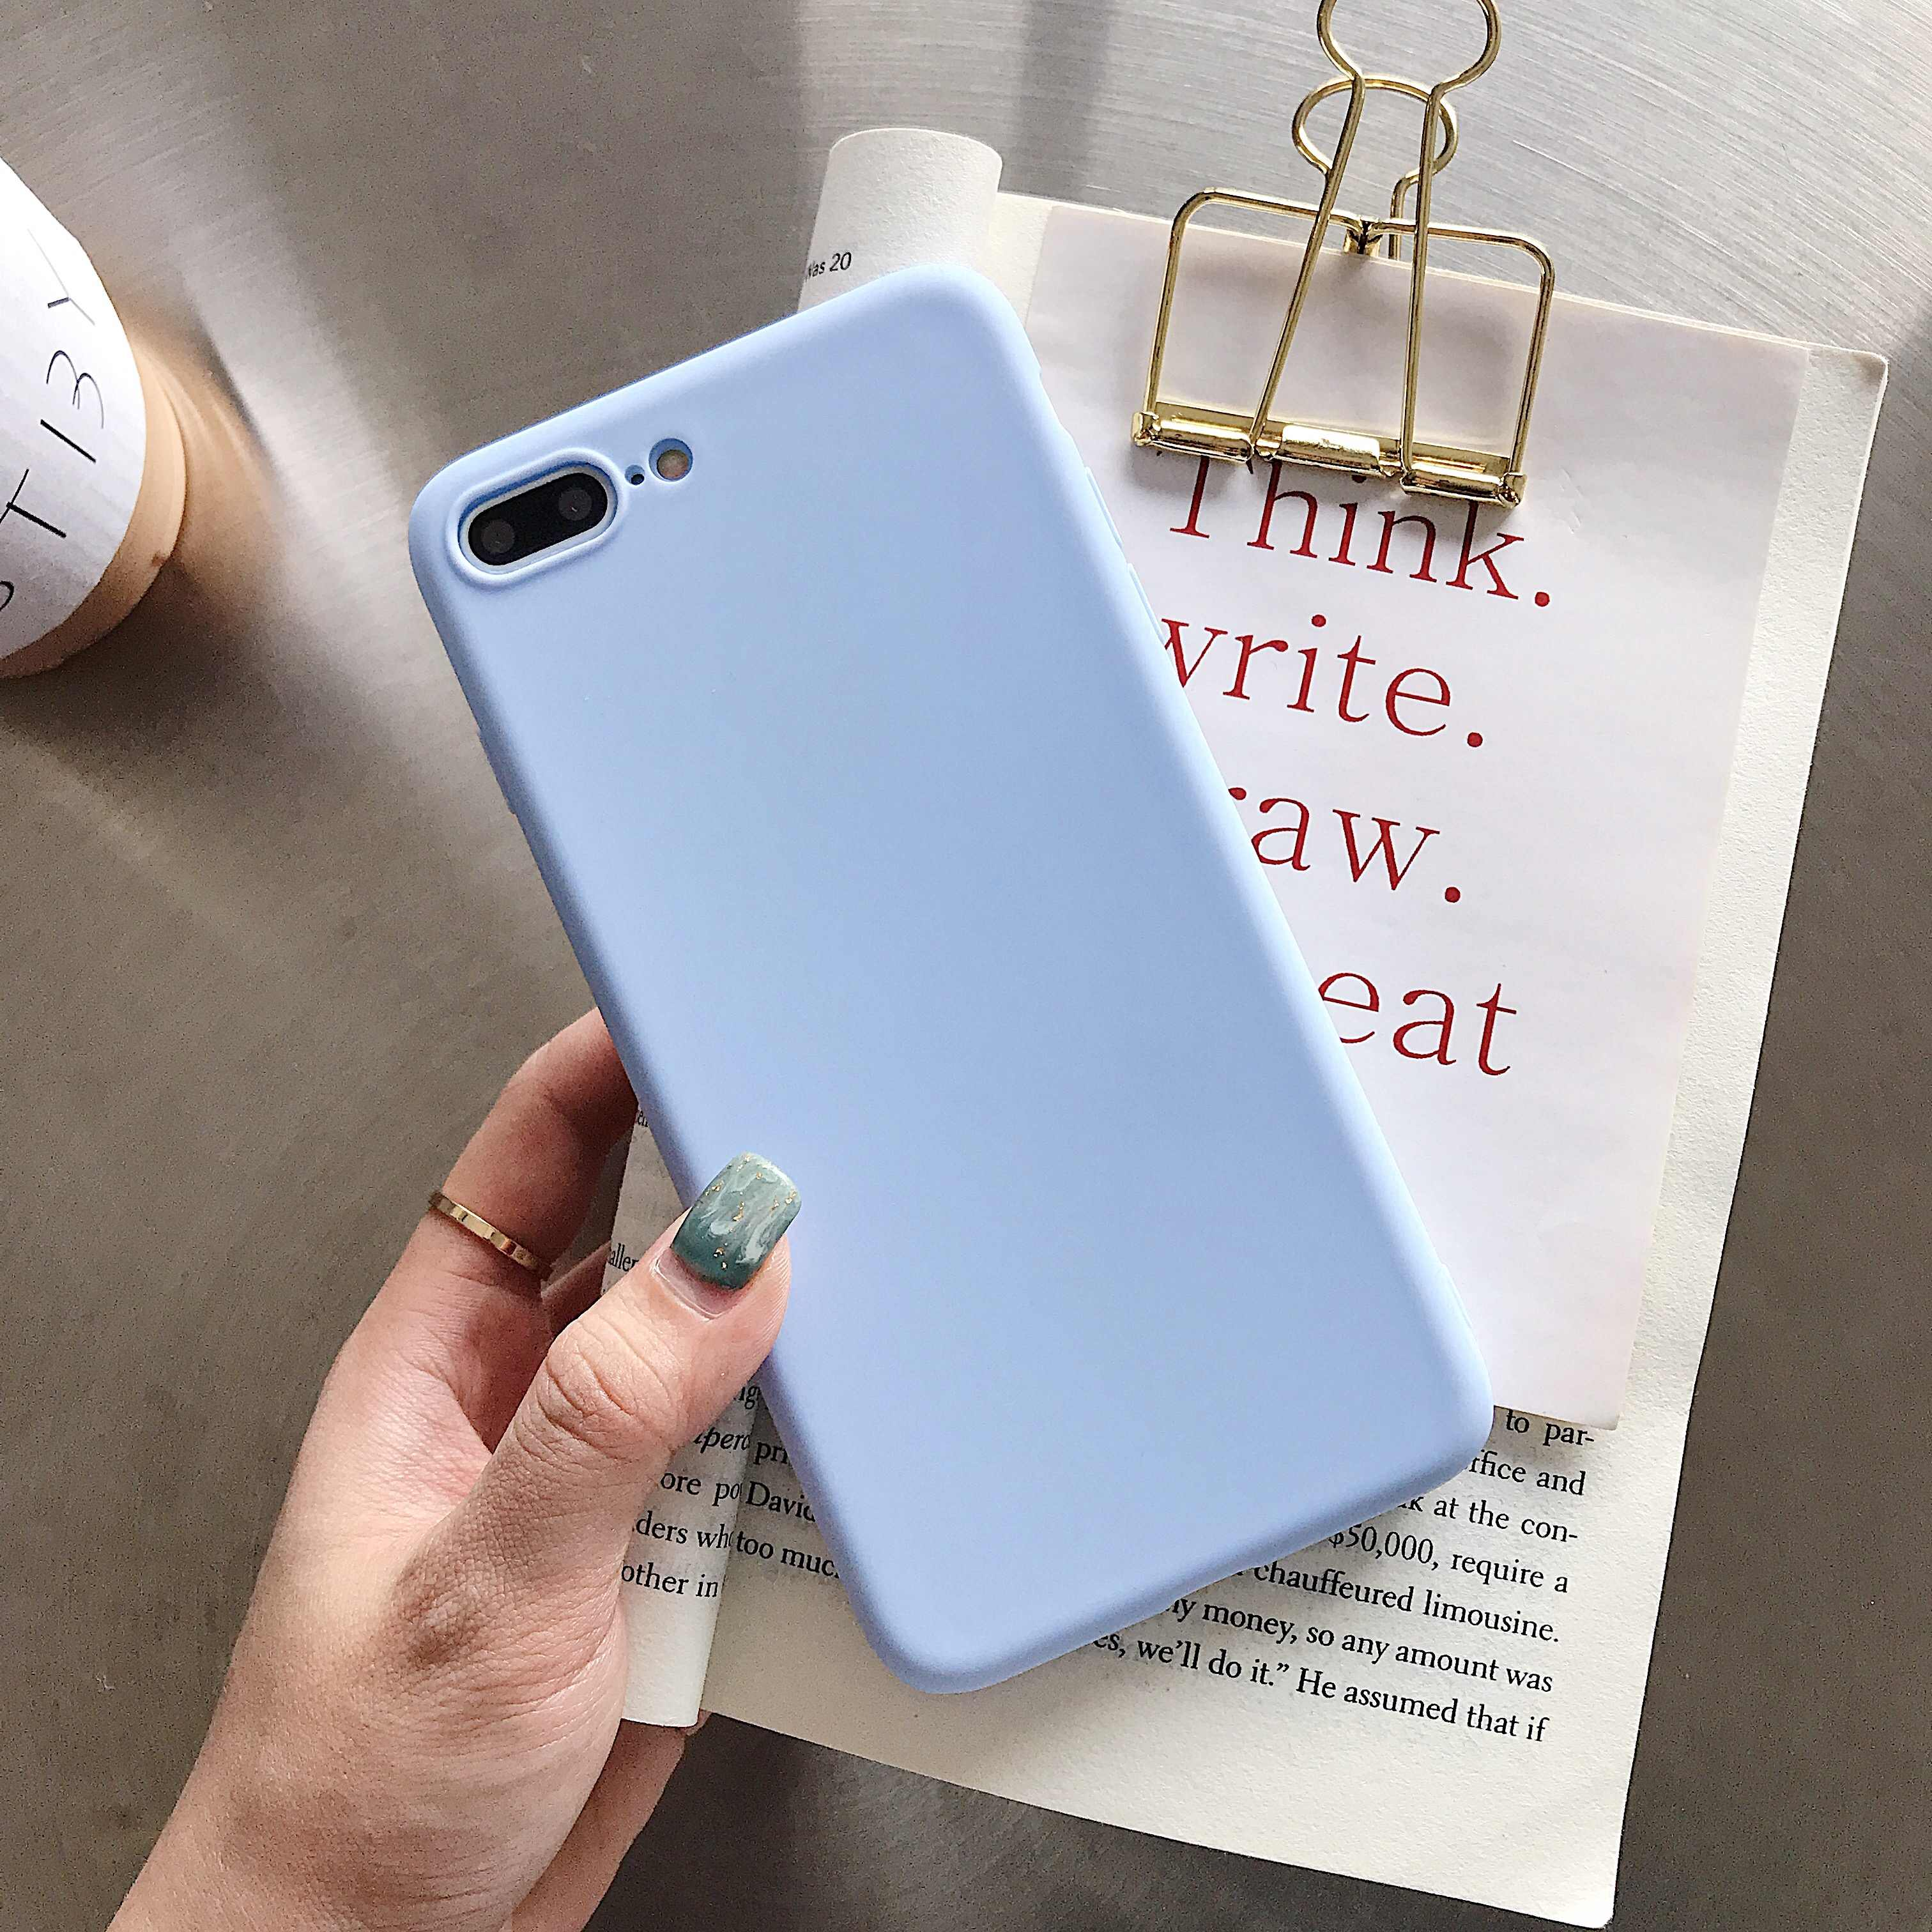 Soft Case for Samsung Galaxy A70 A60 A50 A40s A30 A20 A10 M30 M20 M10 A20E Cute Matte Candy TPU Silicone Cover Fundas Coque Caso